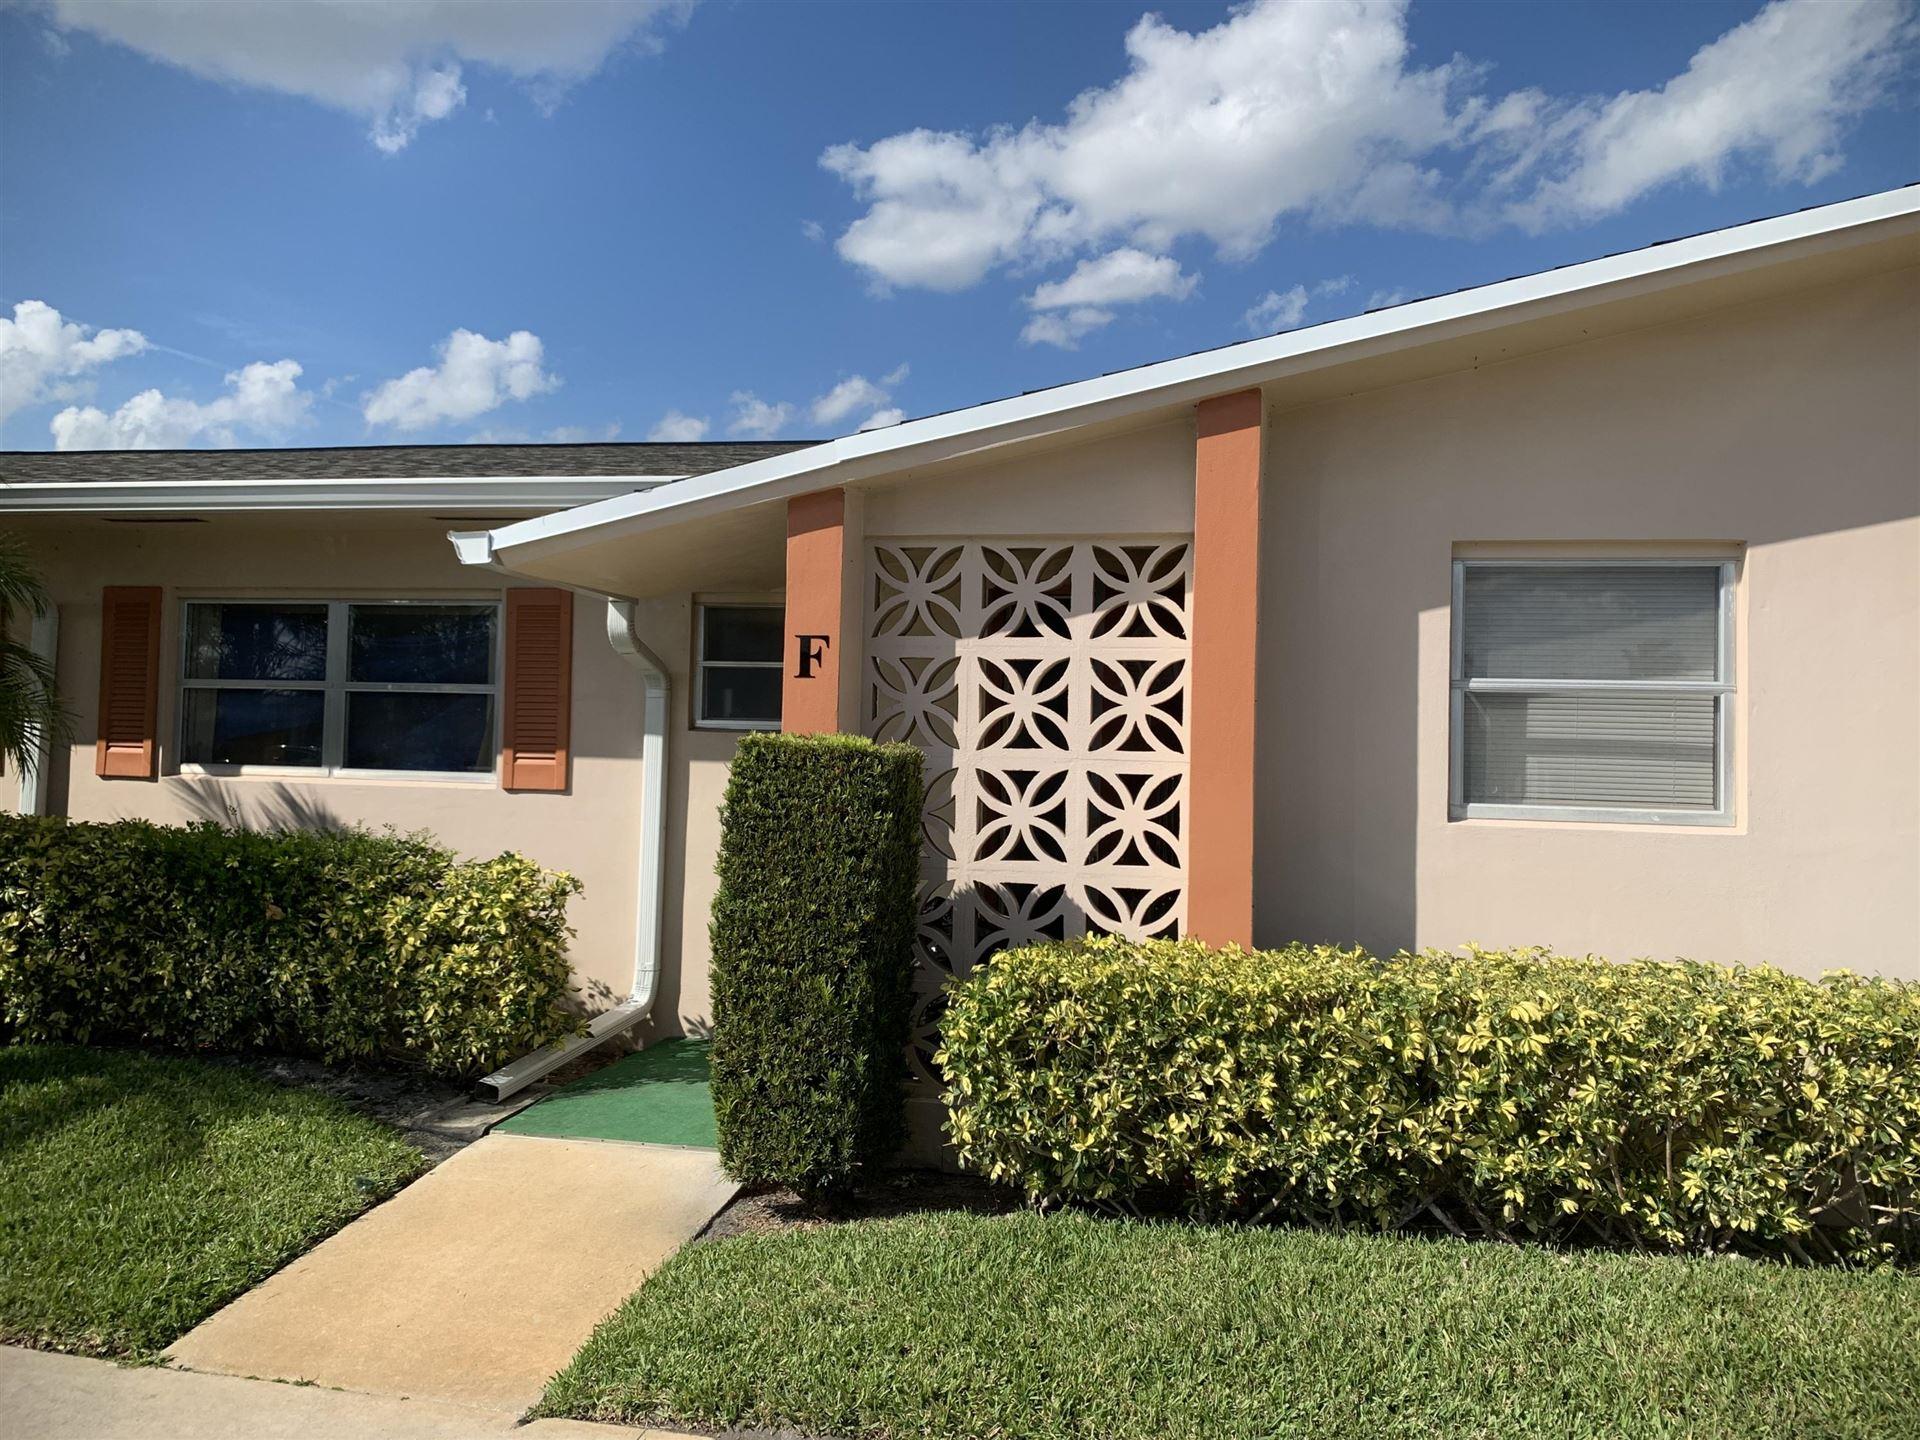 2655 Dudley Drive E #F, West Palm Beach, FL 33415 - MLS#: RX-10719141